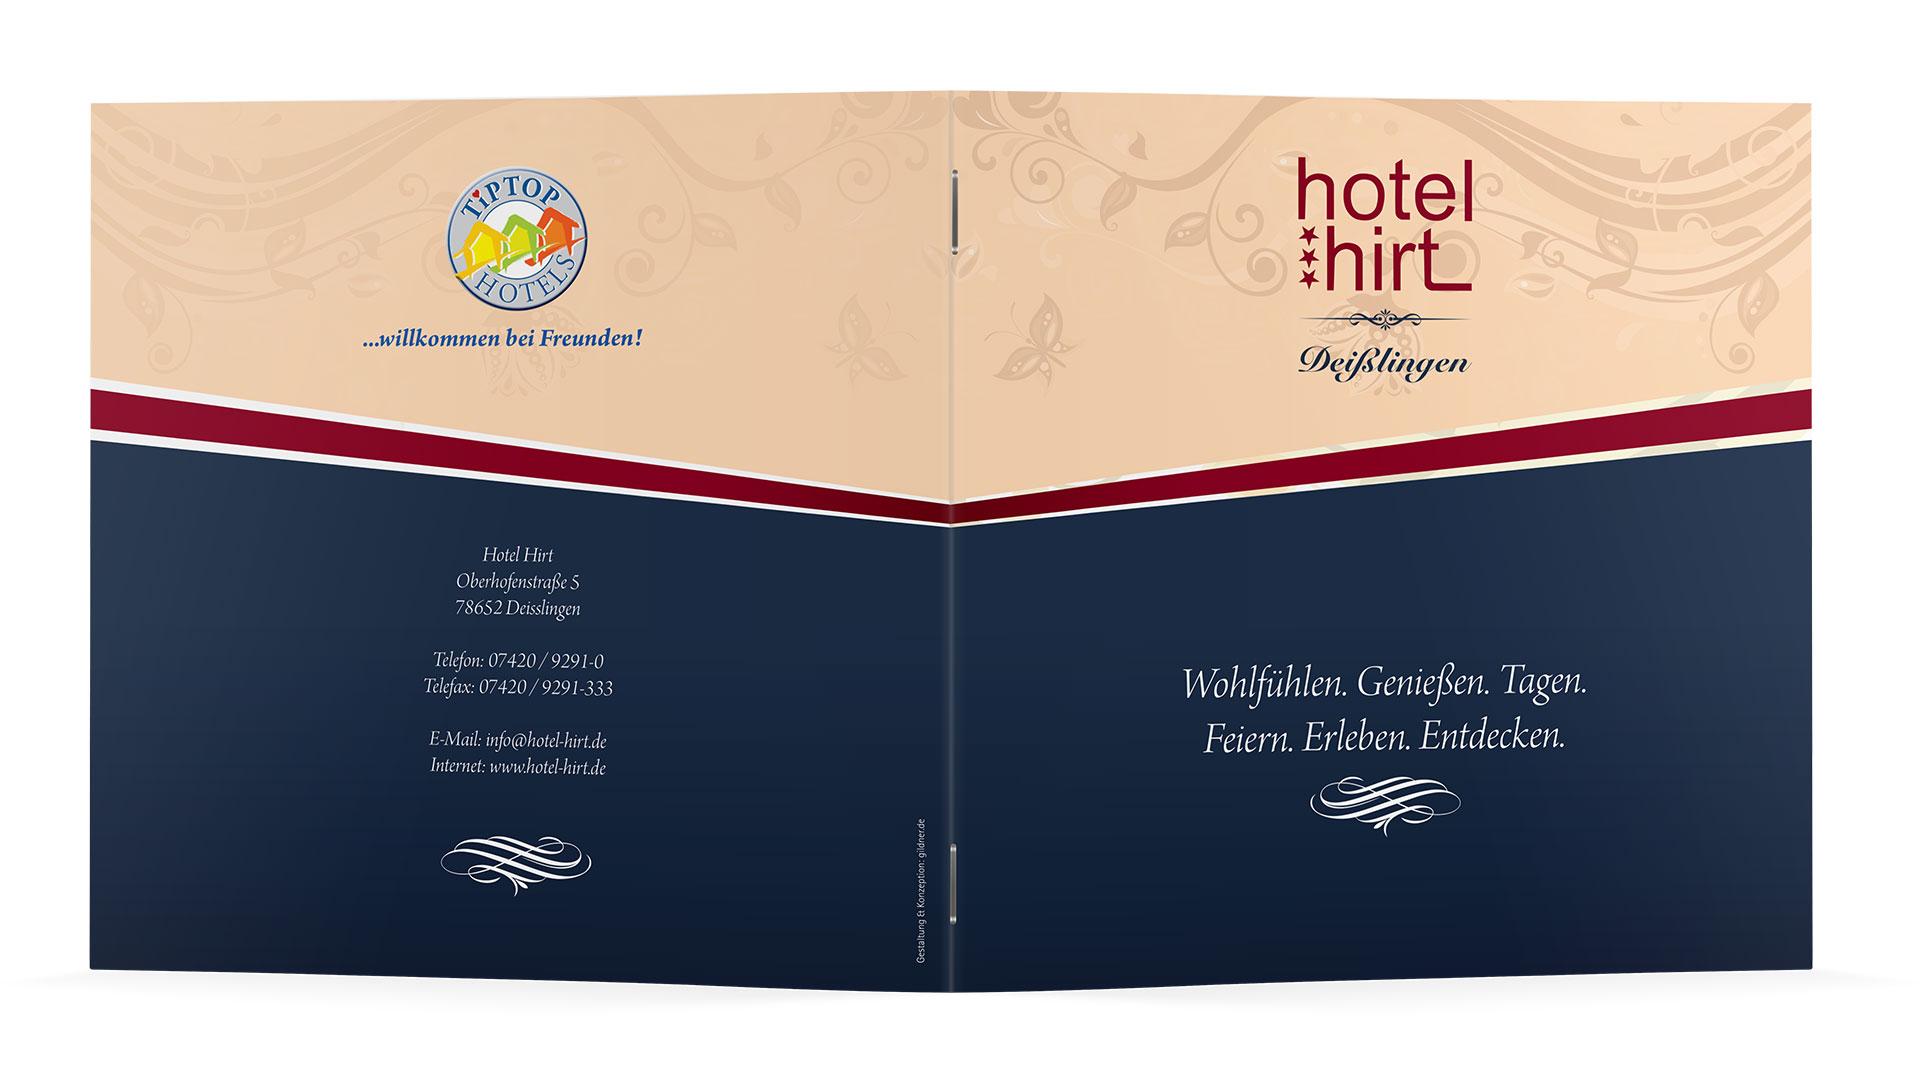 Hotel Hirt